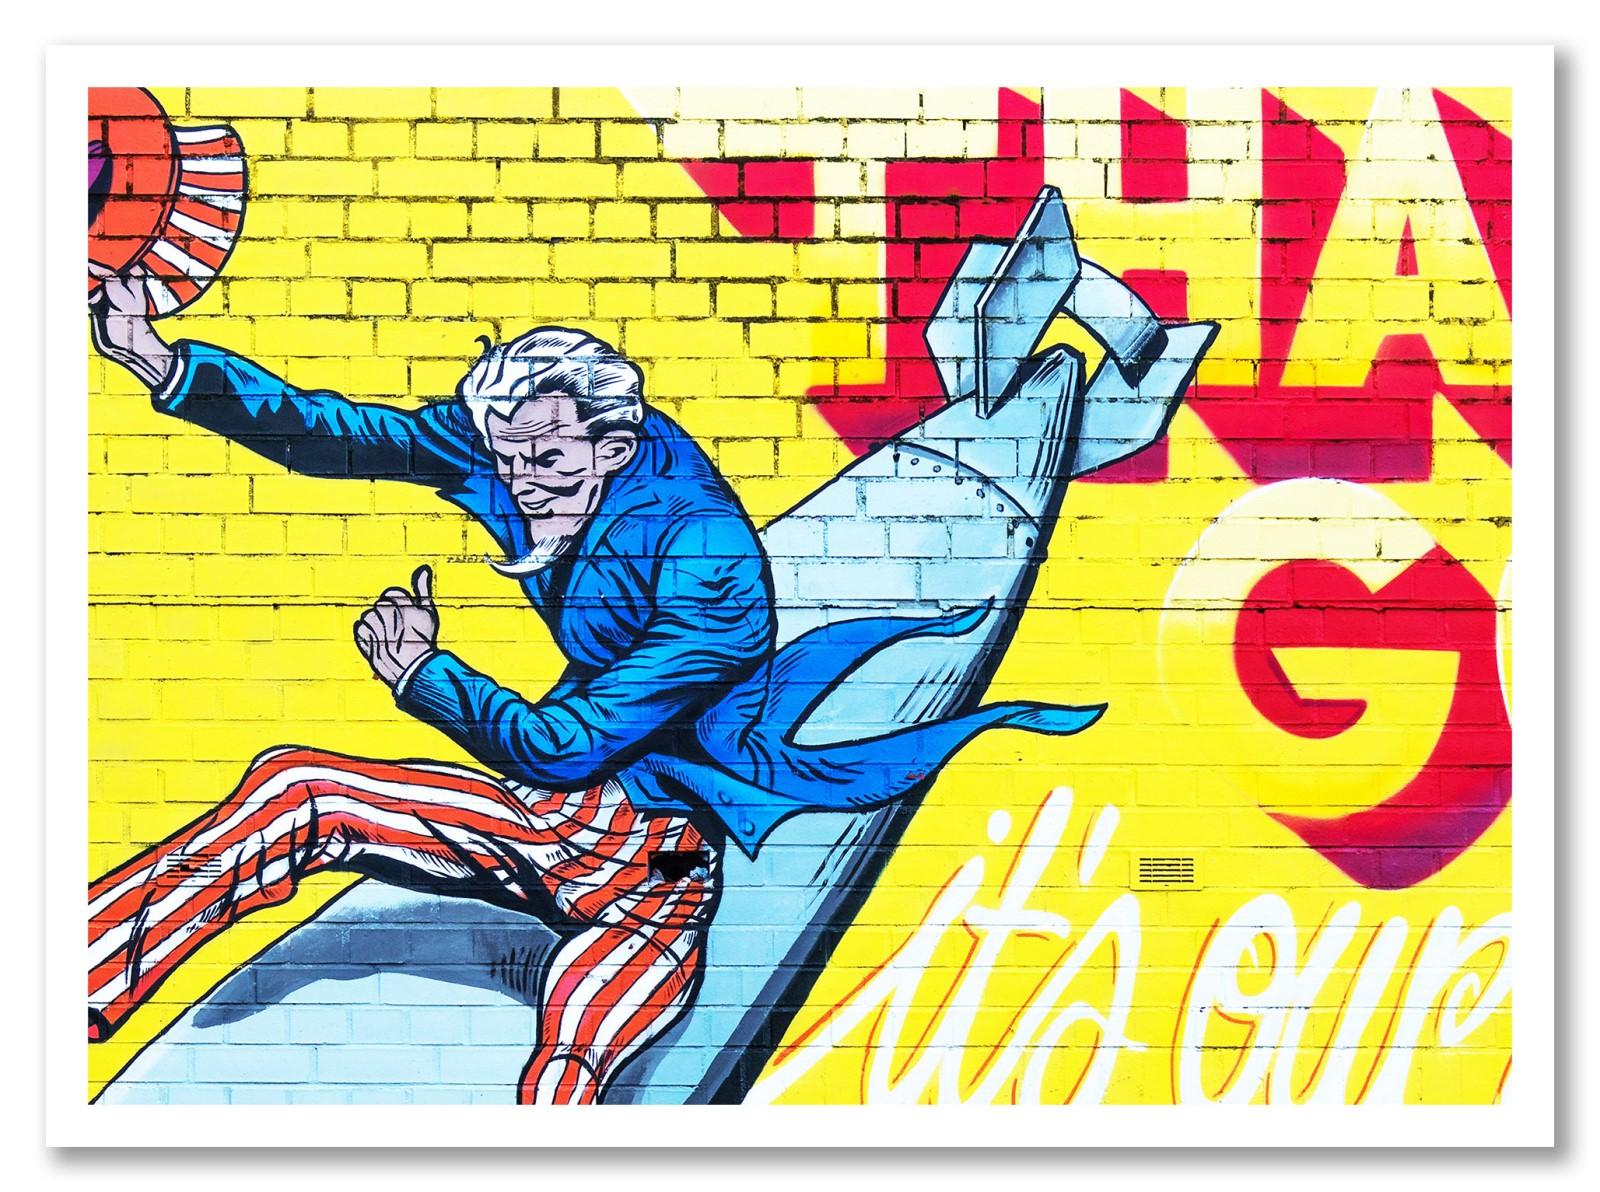 Street Art - Human Bombe